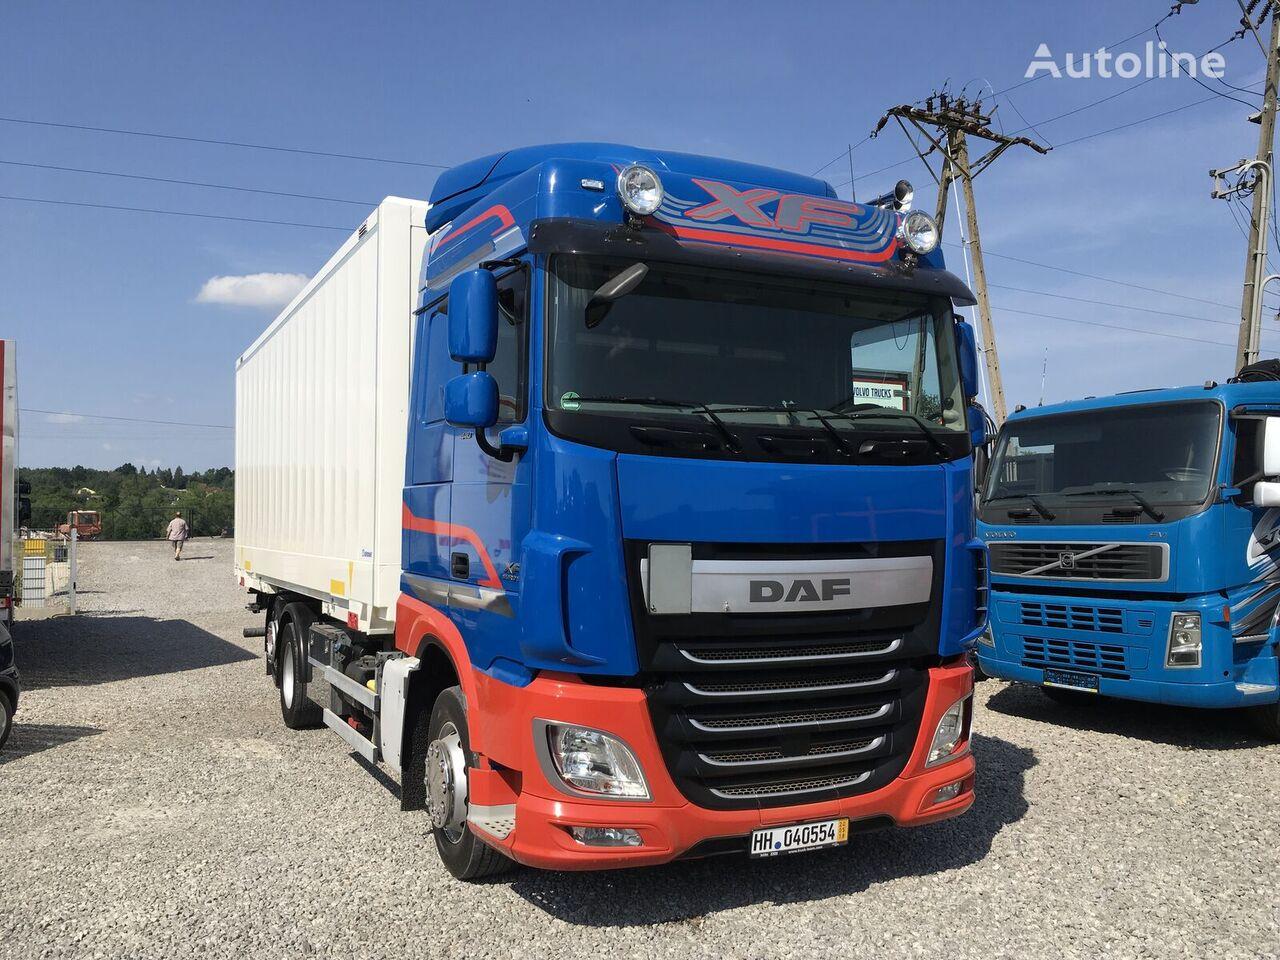 DAF XF 106.440 E6 105 kontener 6x2 , Super stan izotermni kamion